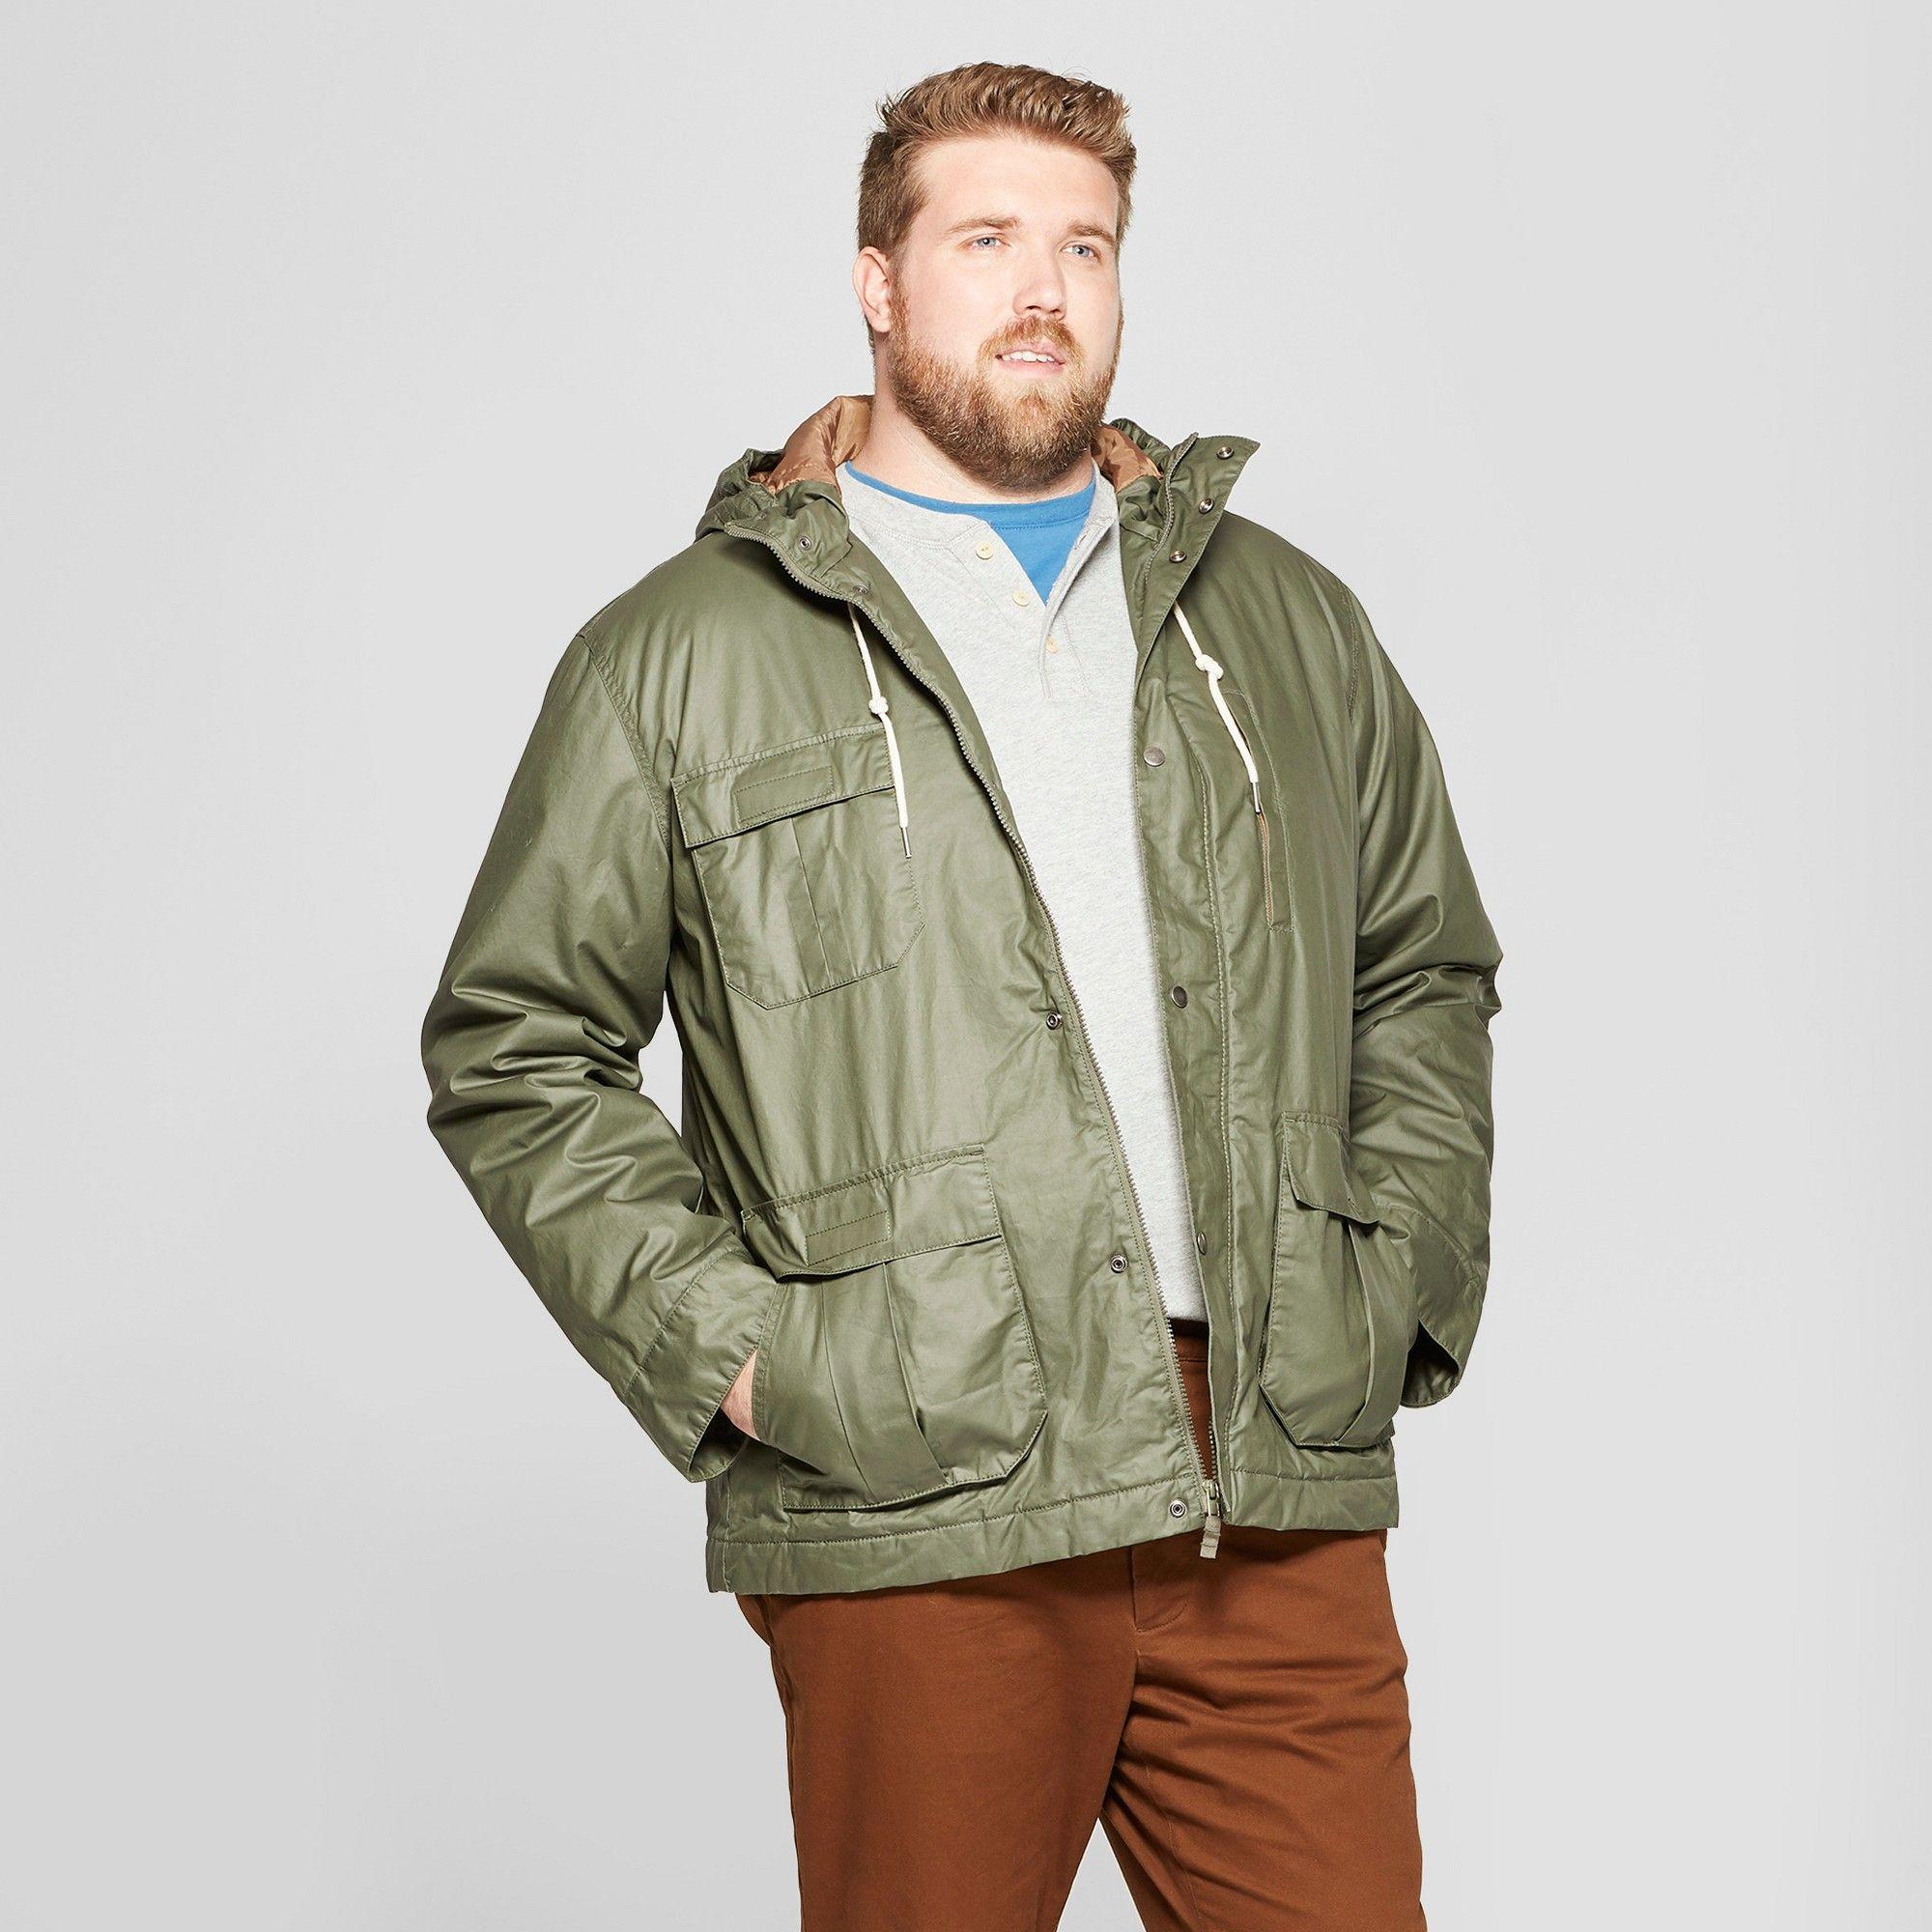 30821f4df petiteMen's Tall Short Base Parka Jacket - Goodfellow & Co Olive MT ...